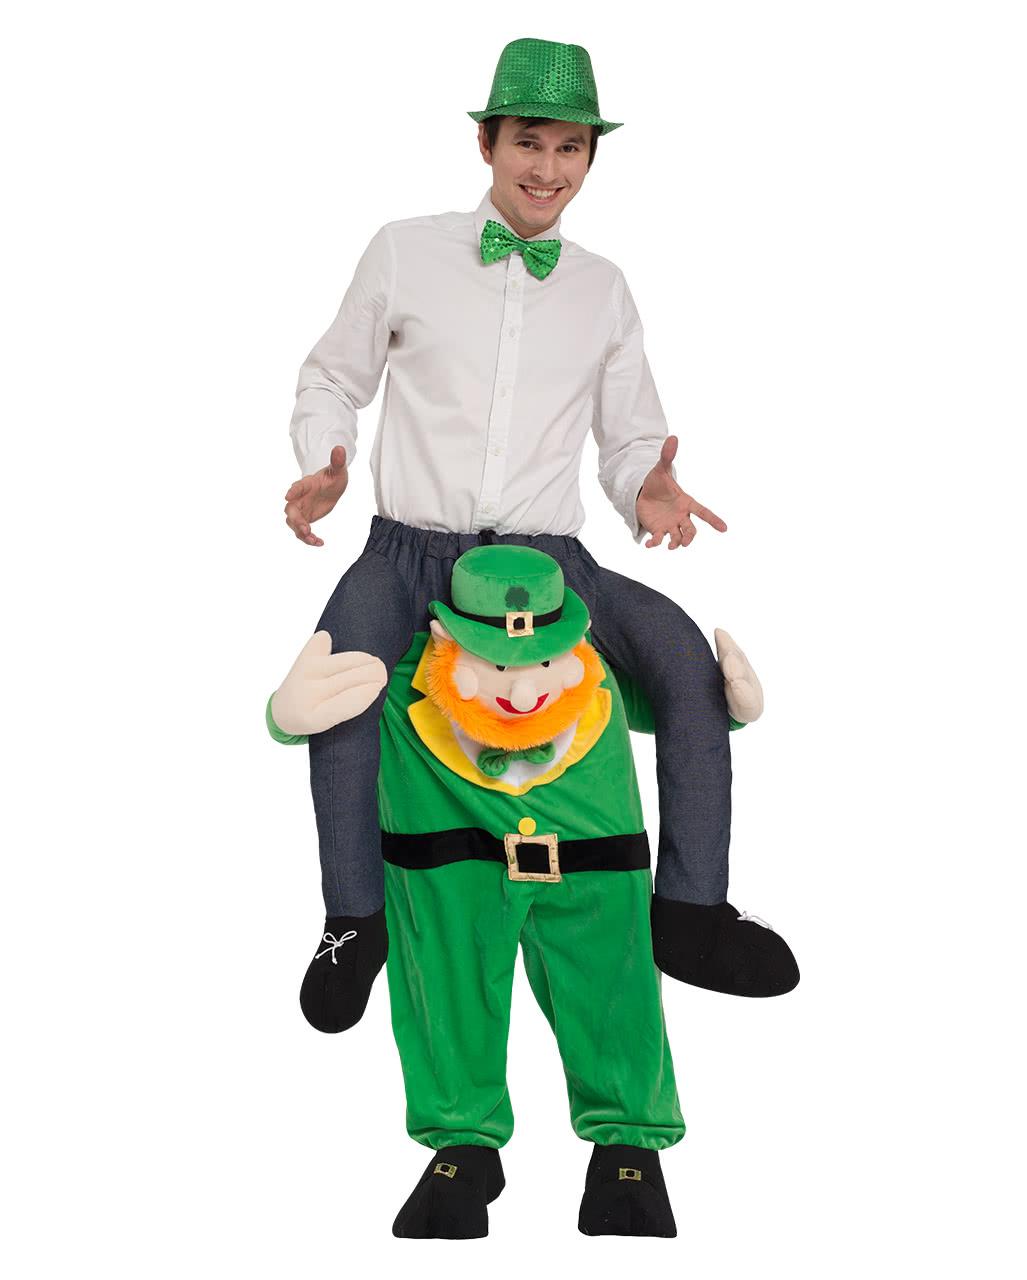 Reiter on Leprechaun Carry Me costume to buy | horror-shop.com